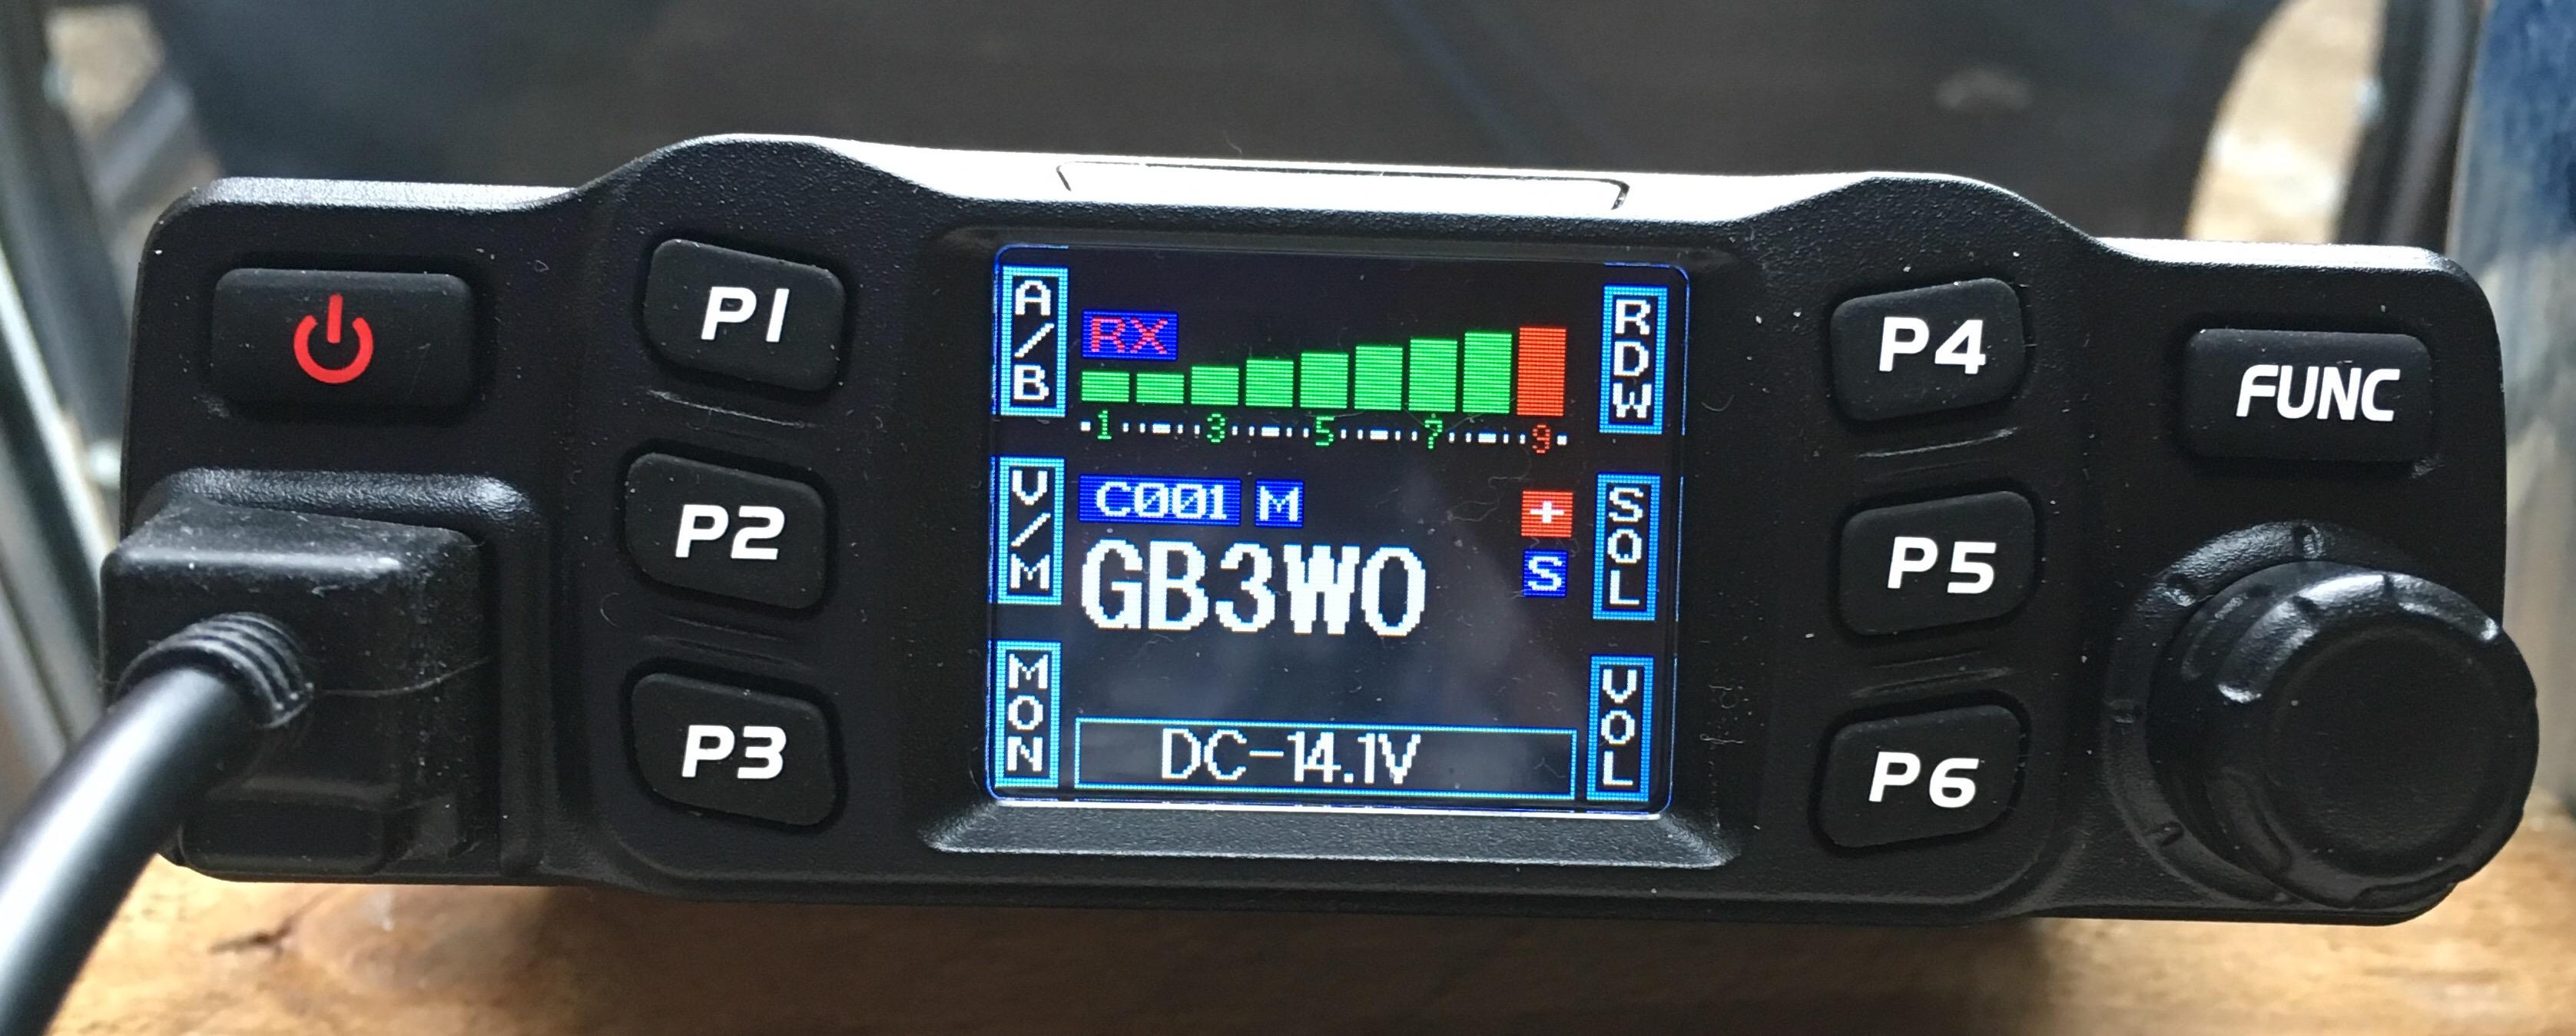 AnyTone AT-778V/U 2/70 Dual Band Transceiver